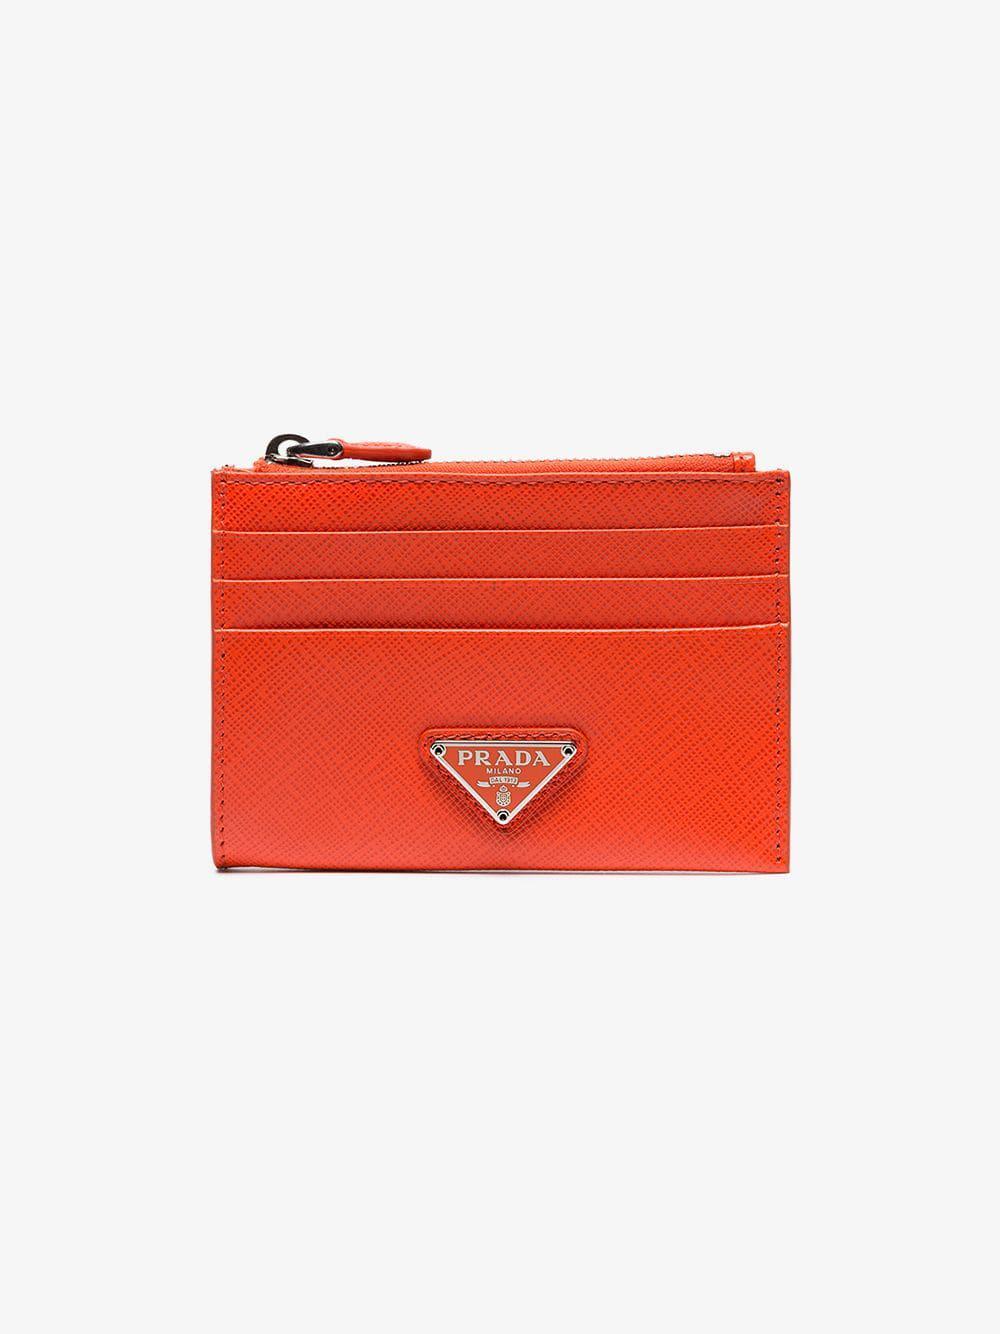 43f56a61a1 Prada Orange Logo Embellished Leather Zipped Card Case in Orange - Lyst